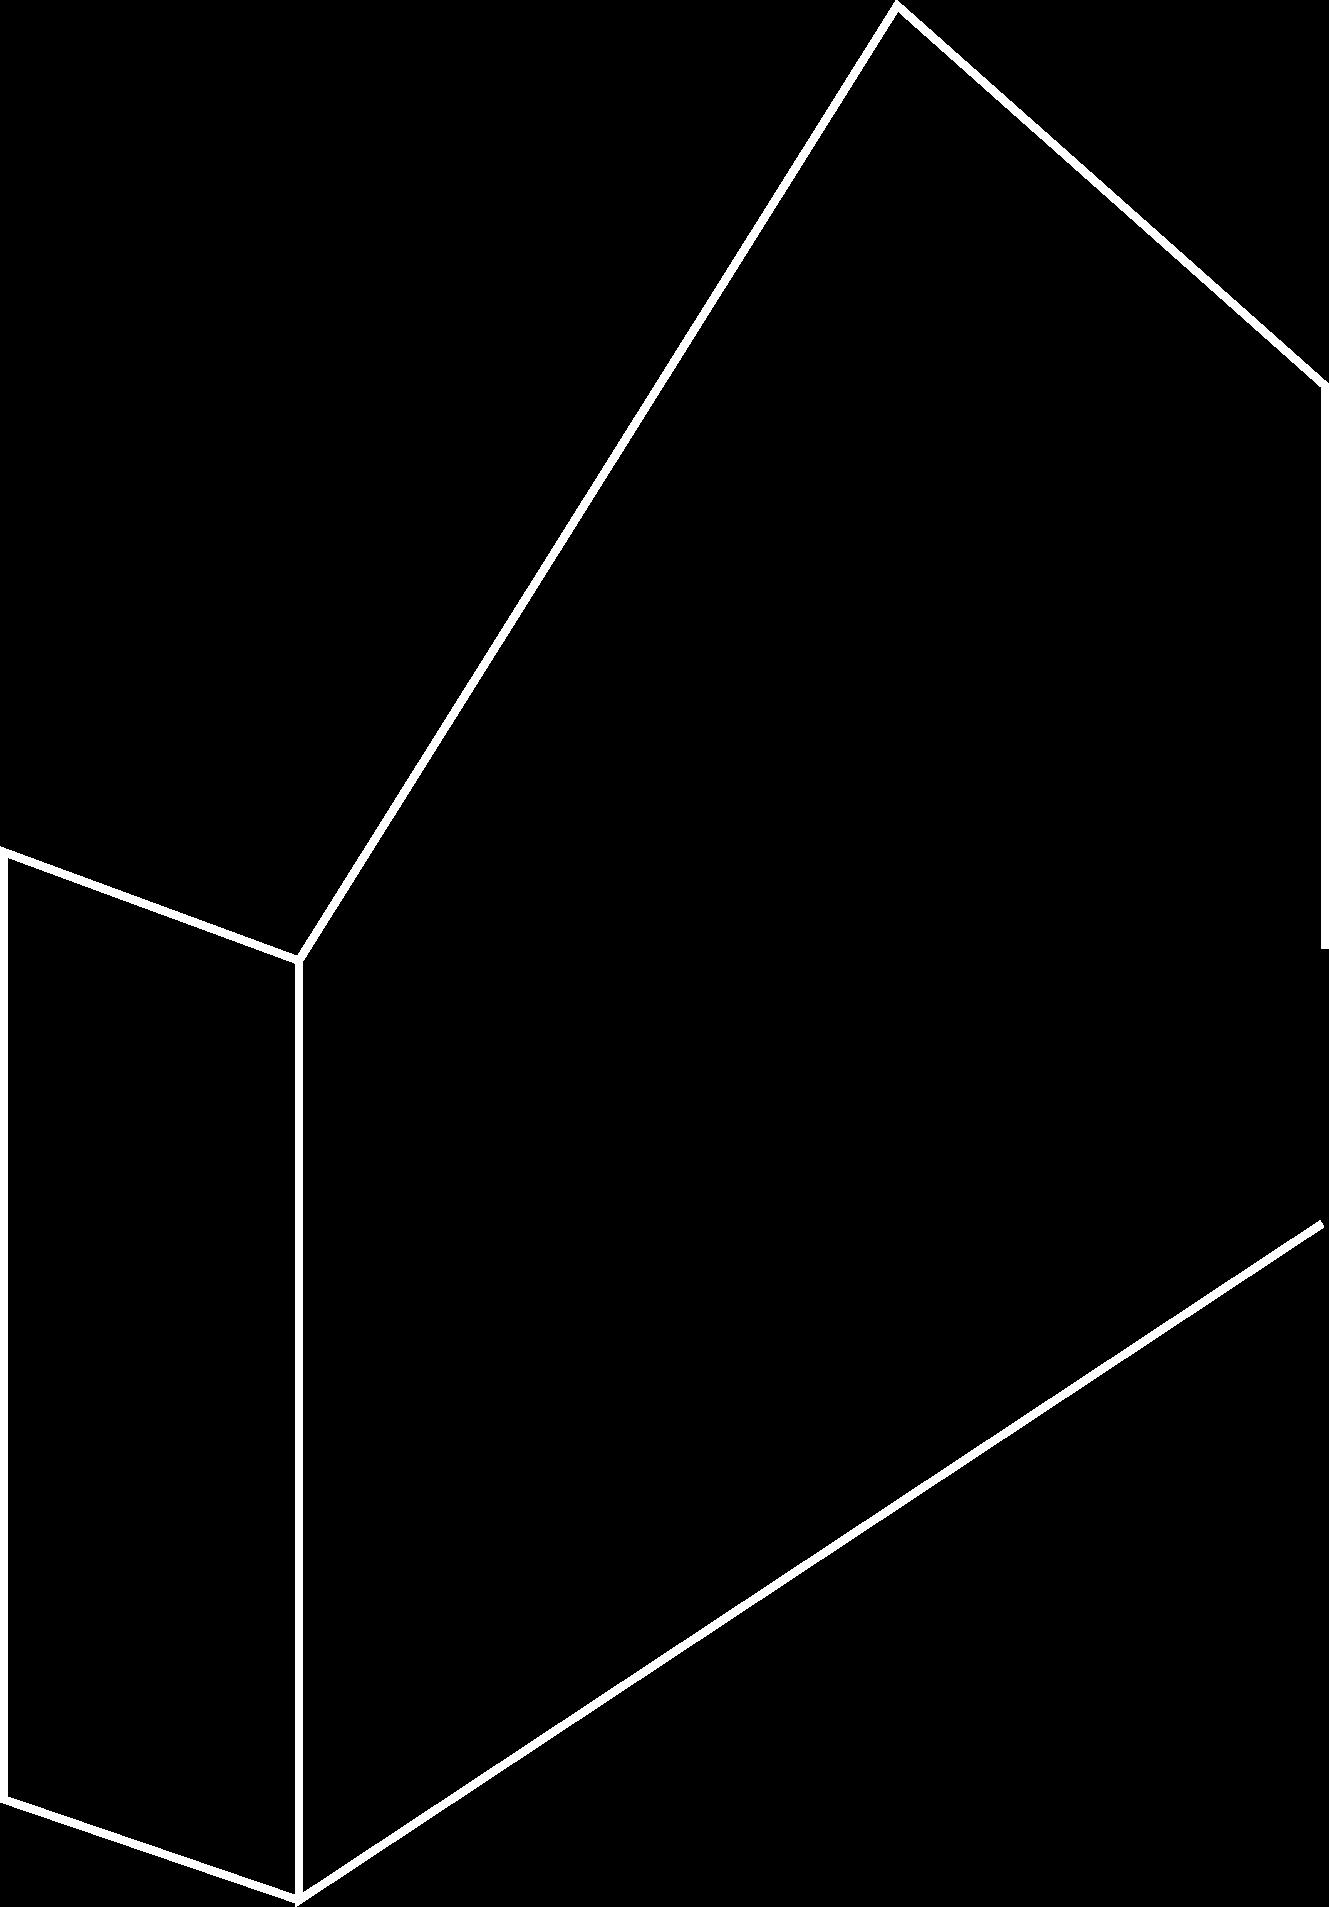 Lignes blanches